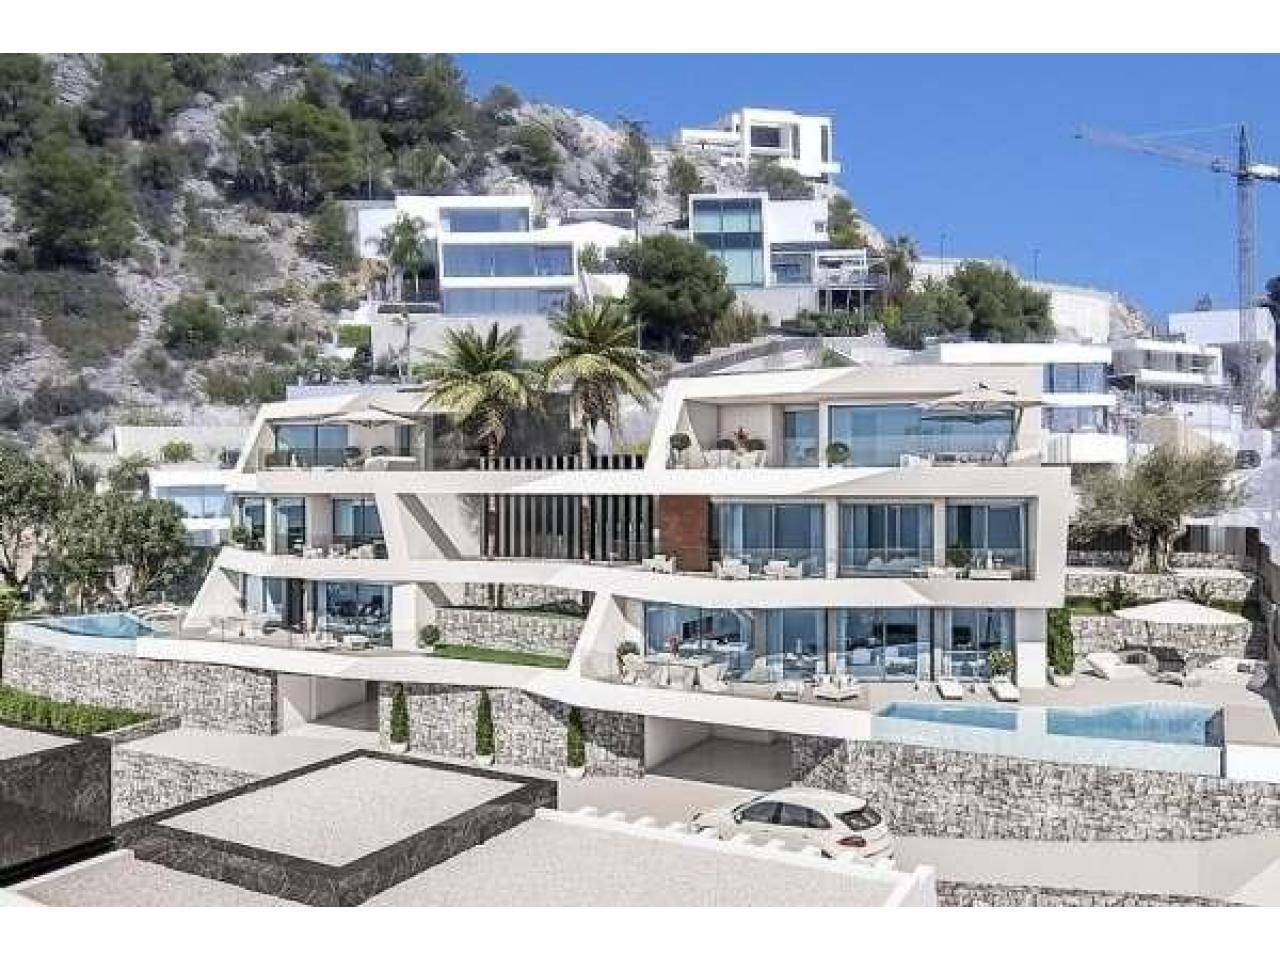 Недвижимость в Испании, Новая вилла с видами на море от застройщика в Альтеа,Коста Бланка,Испания - 5